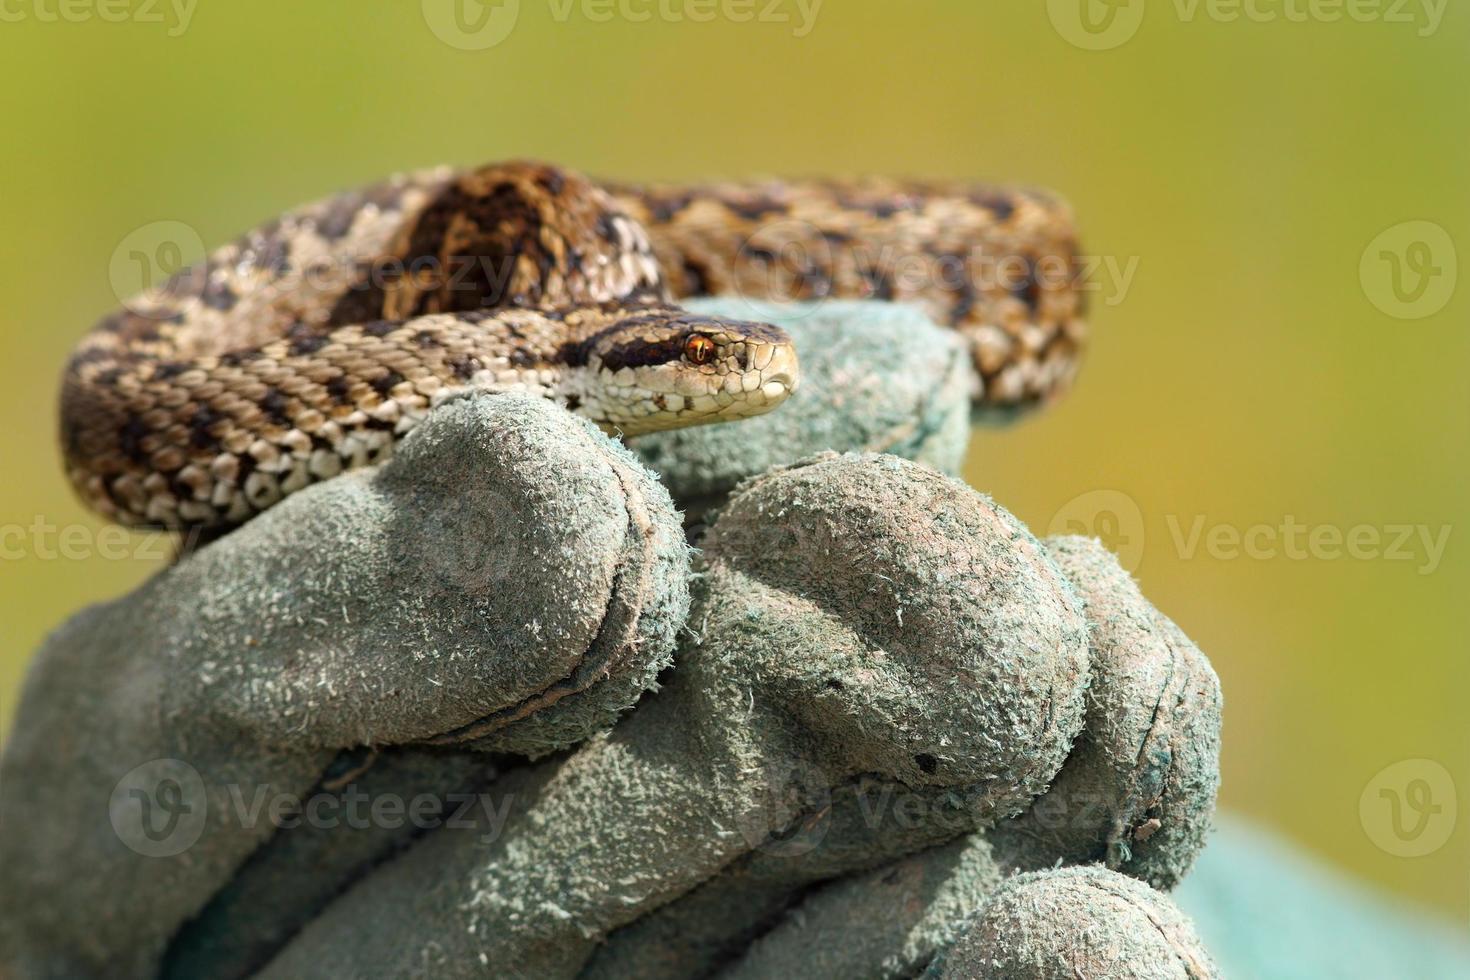 meadow viper on glove photo